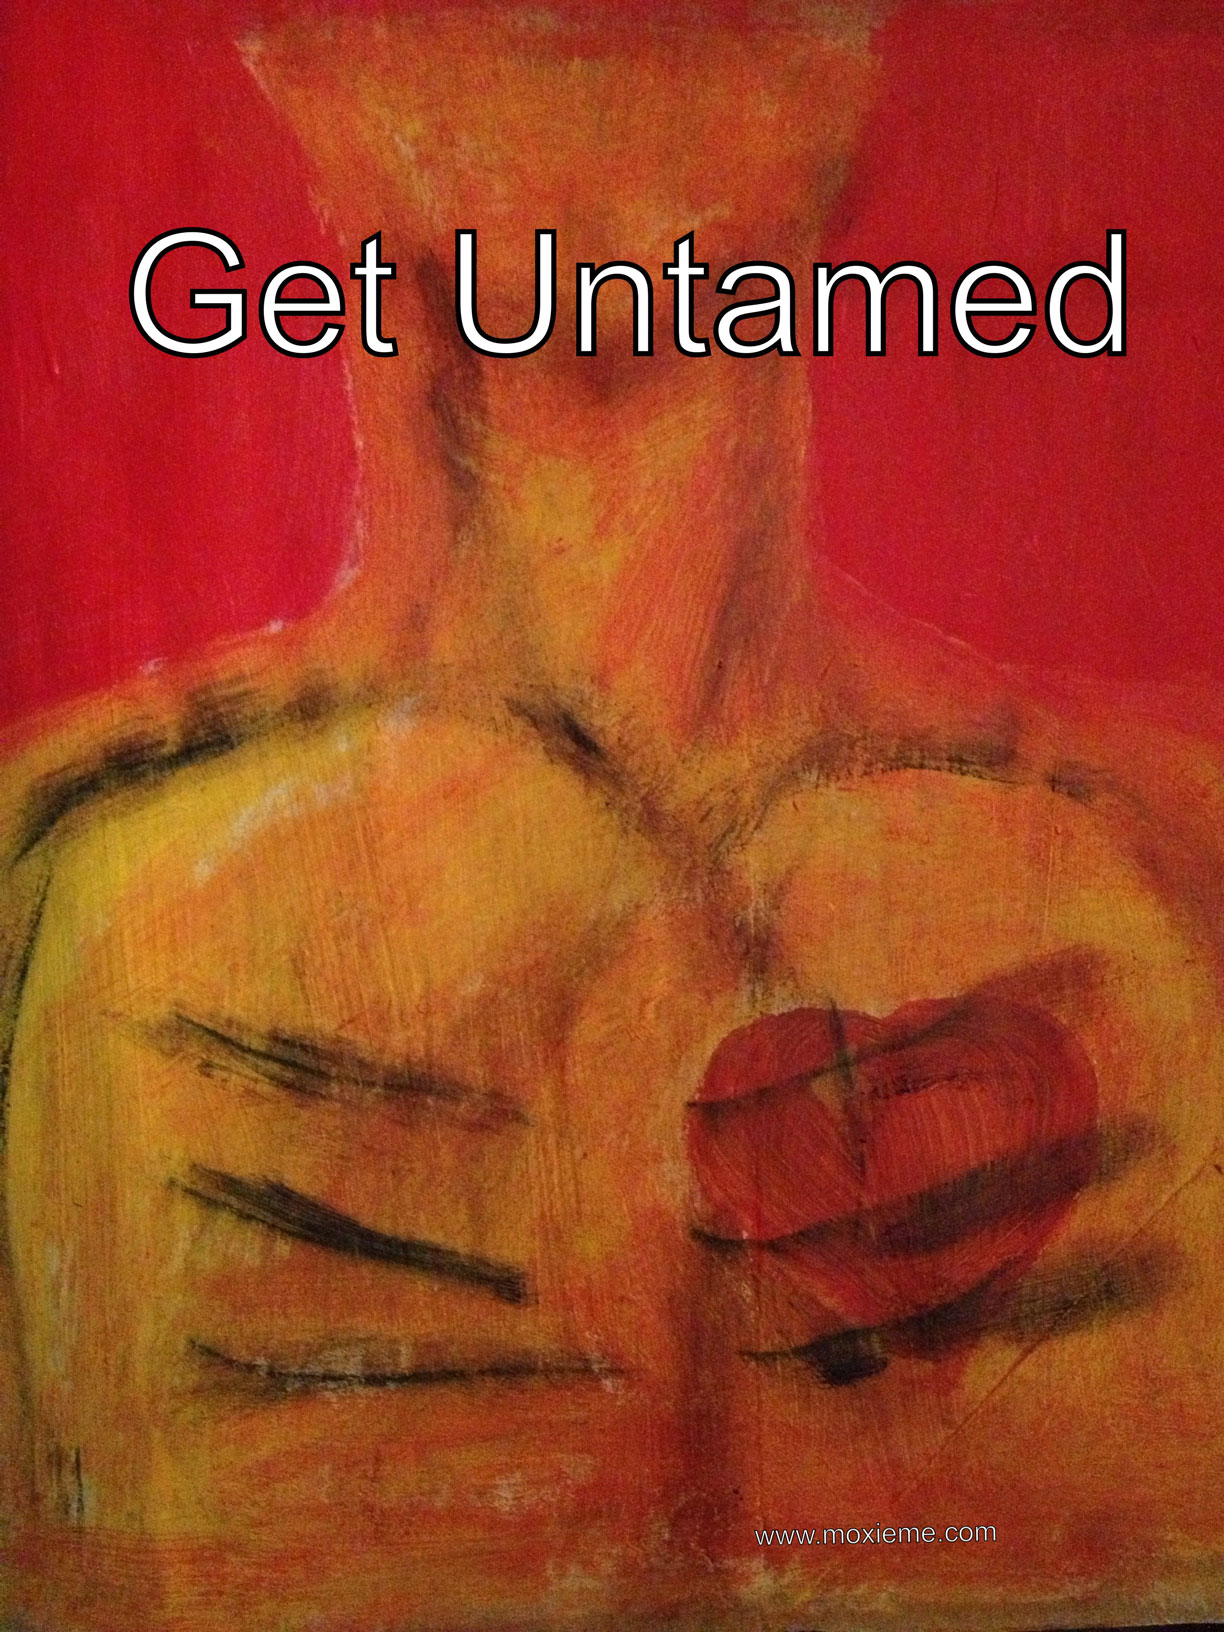 Get-Untamed